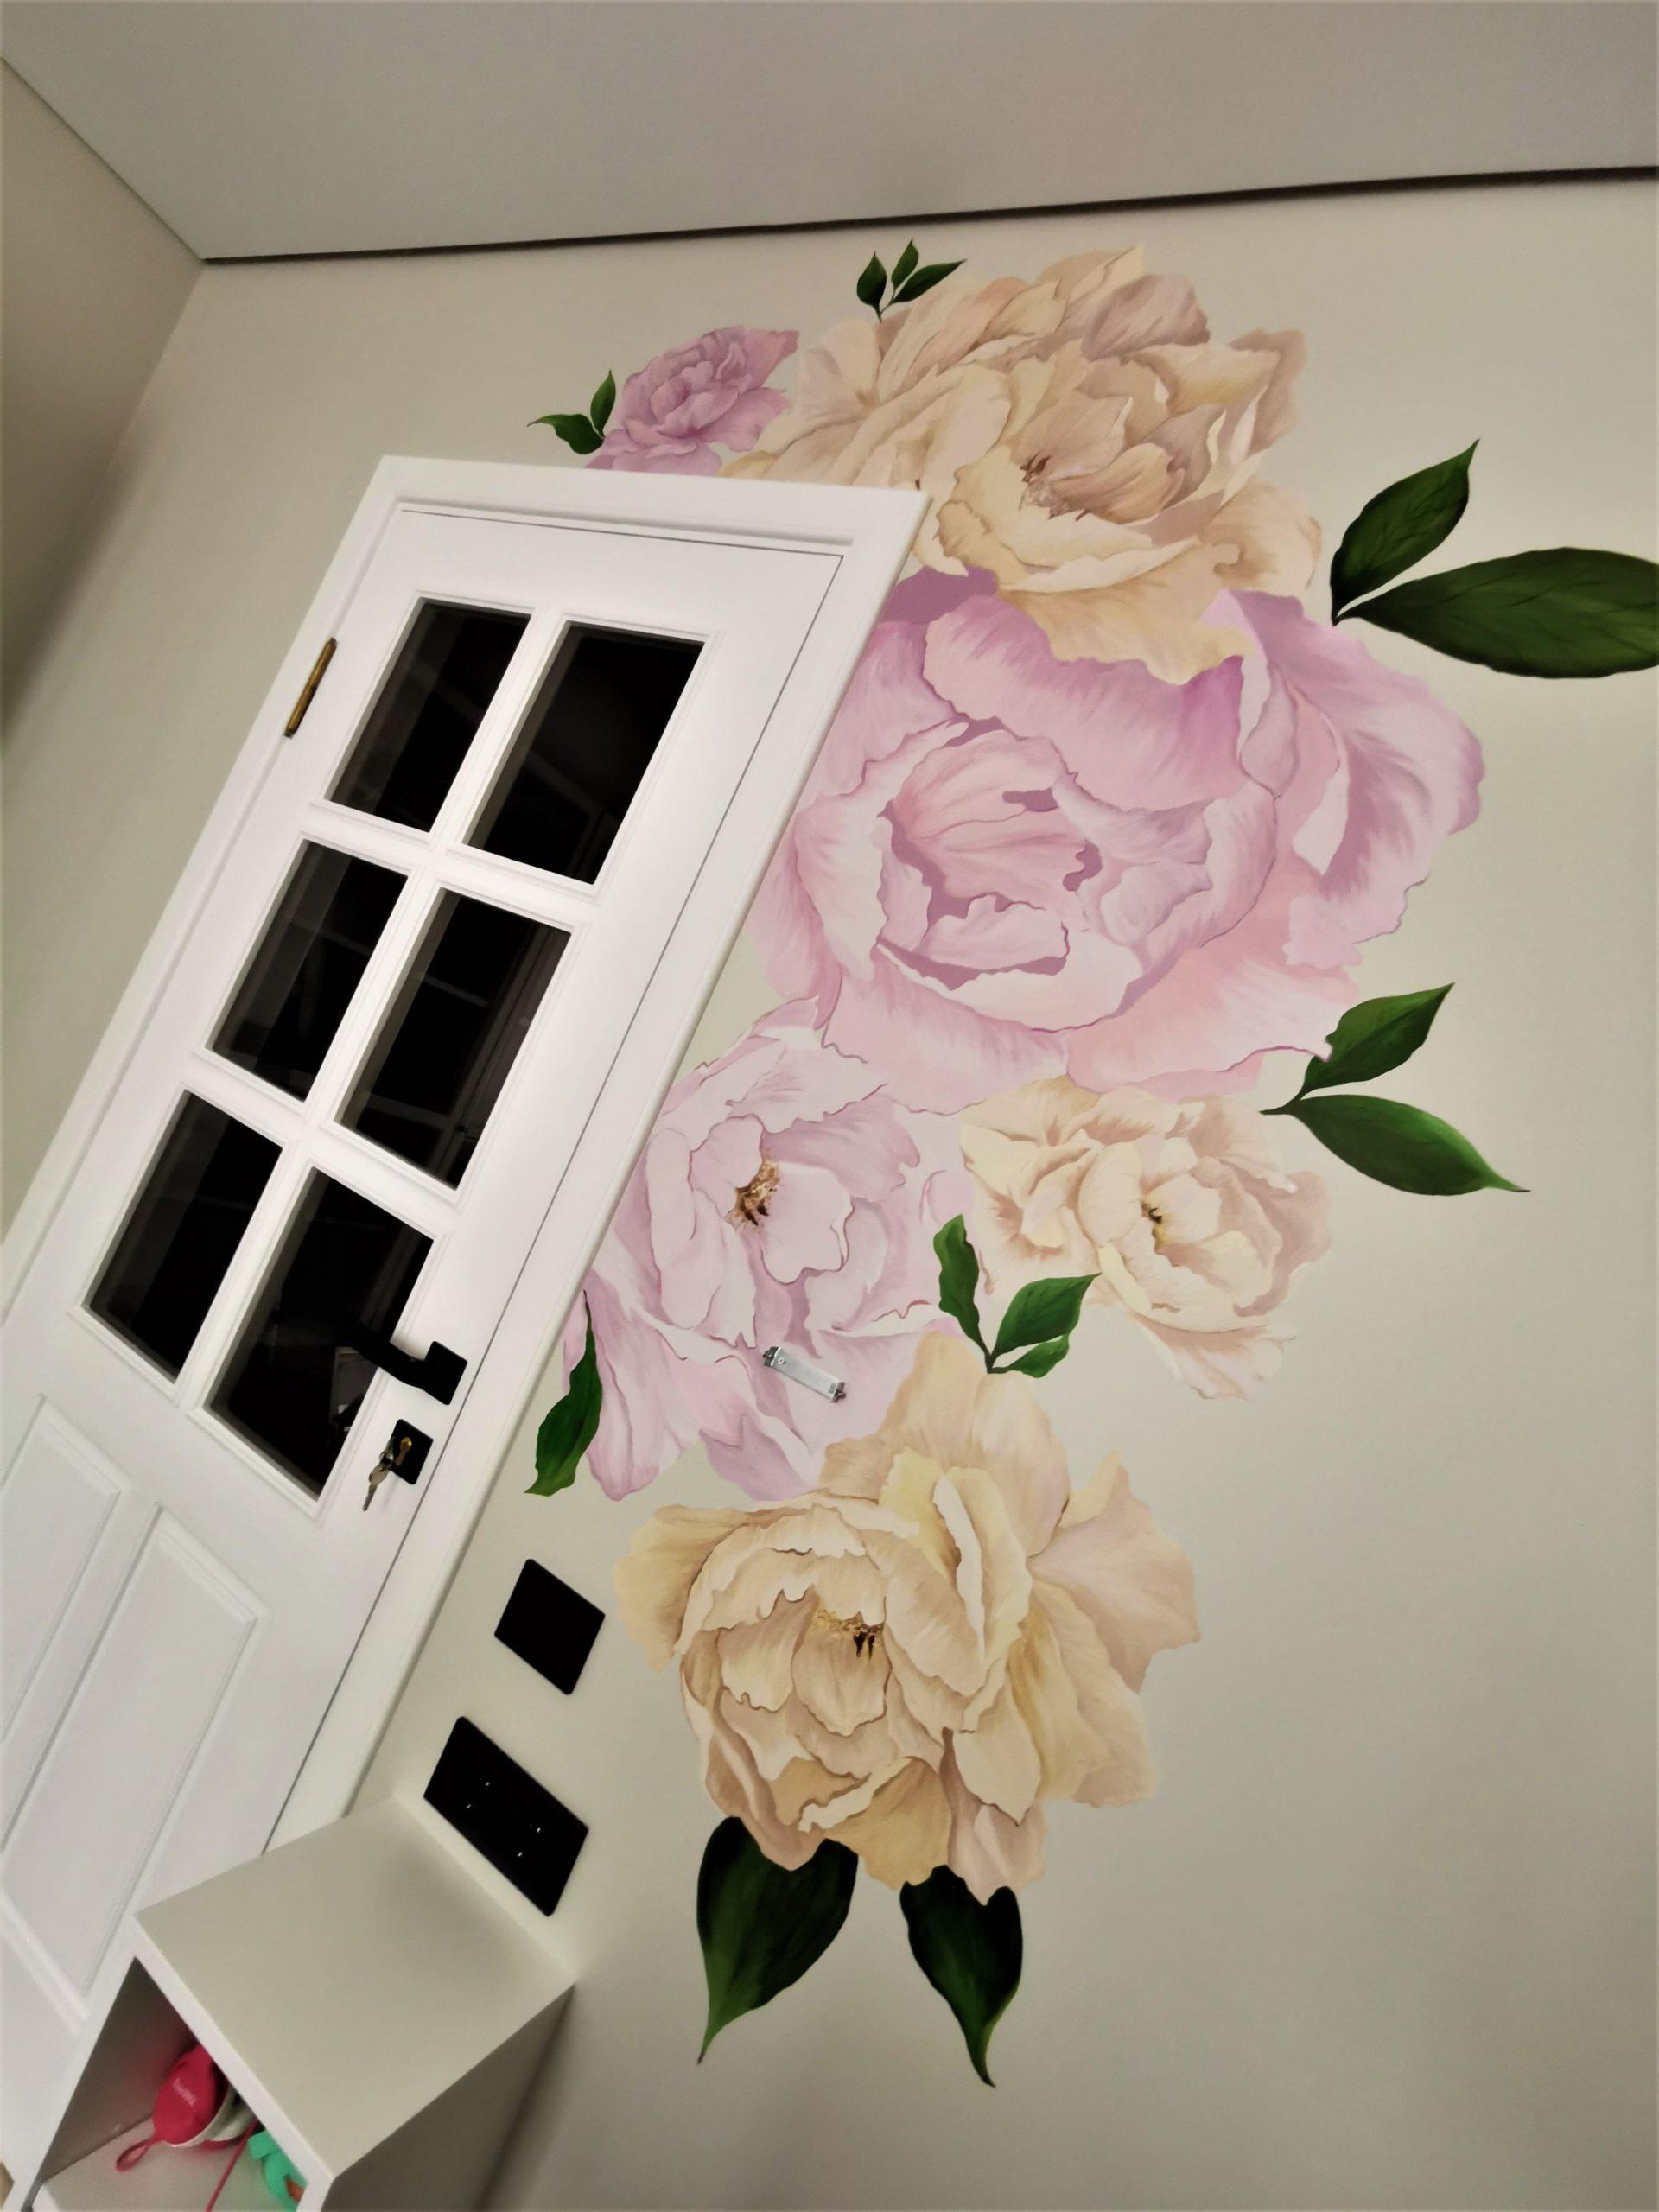 menine-kuryba-sienu-dekoravimas (1)